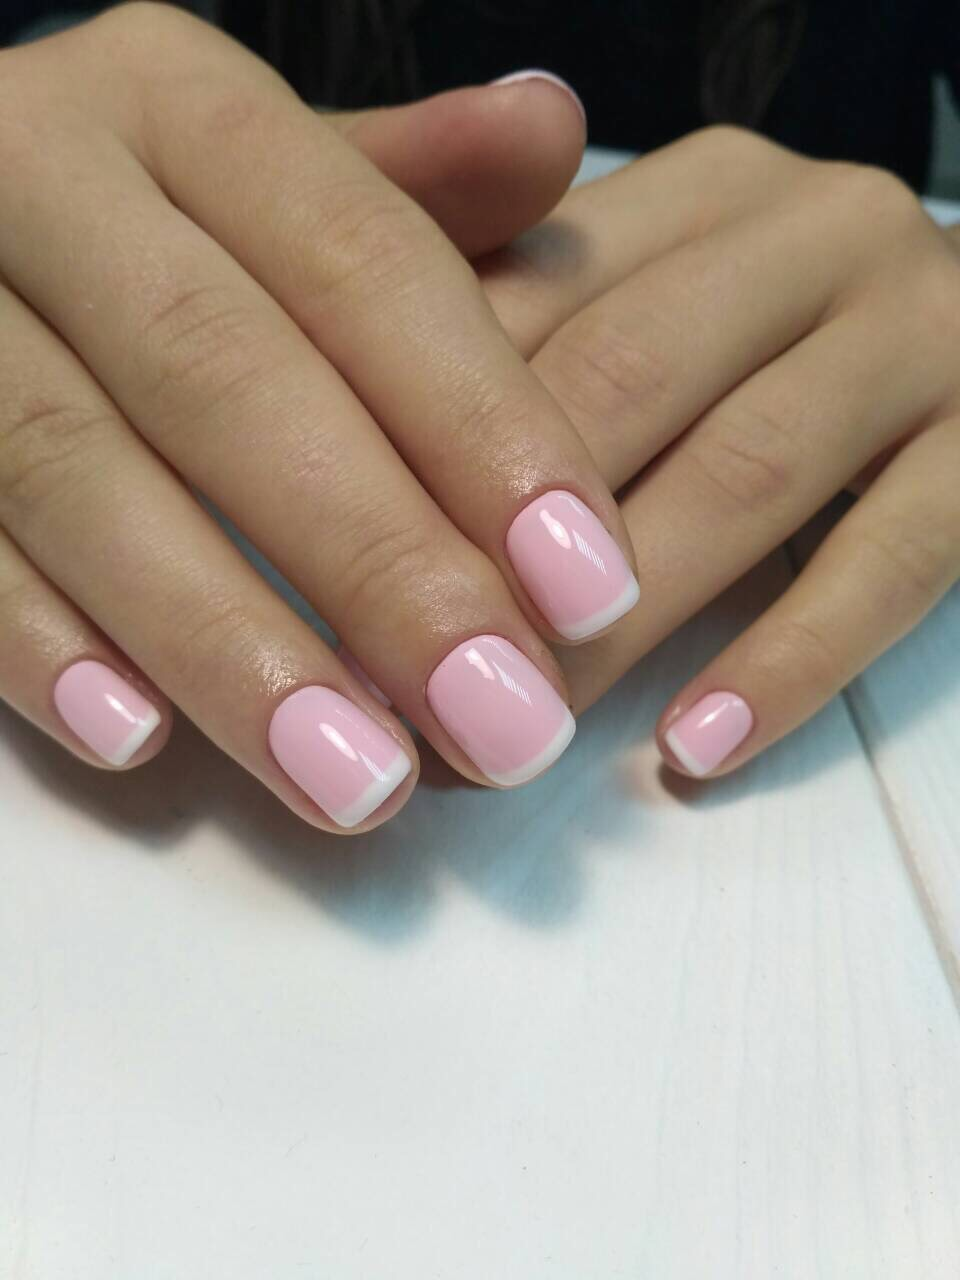 Женский маникюр, наращивание, уход за ногтями и руками от 8 руб.